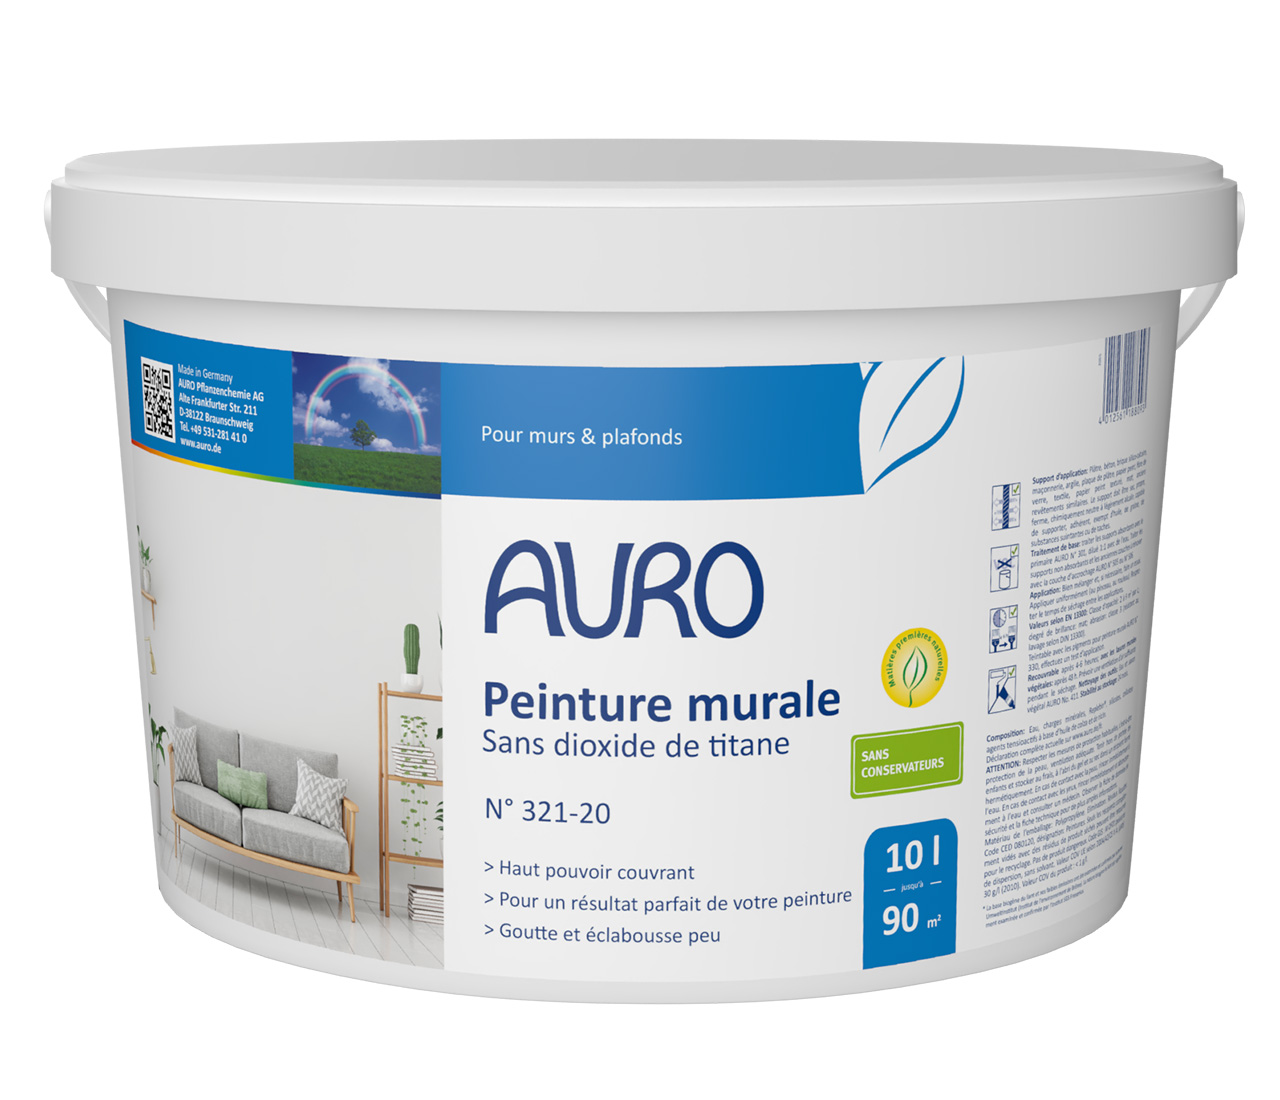 321-20-10.0-Peinture-murale-san-dioxide-de-titane